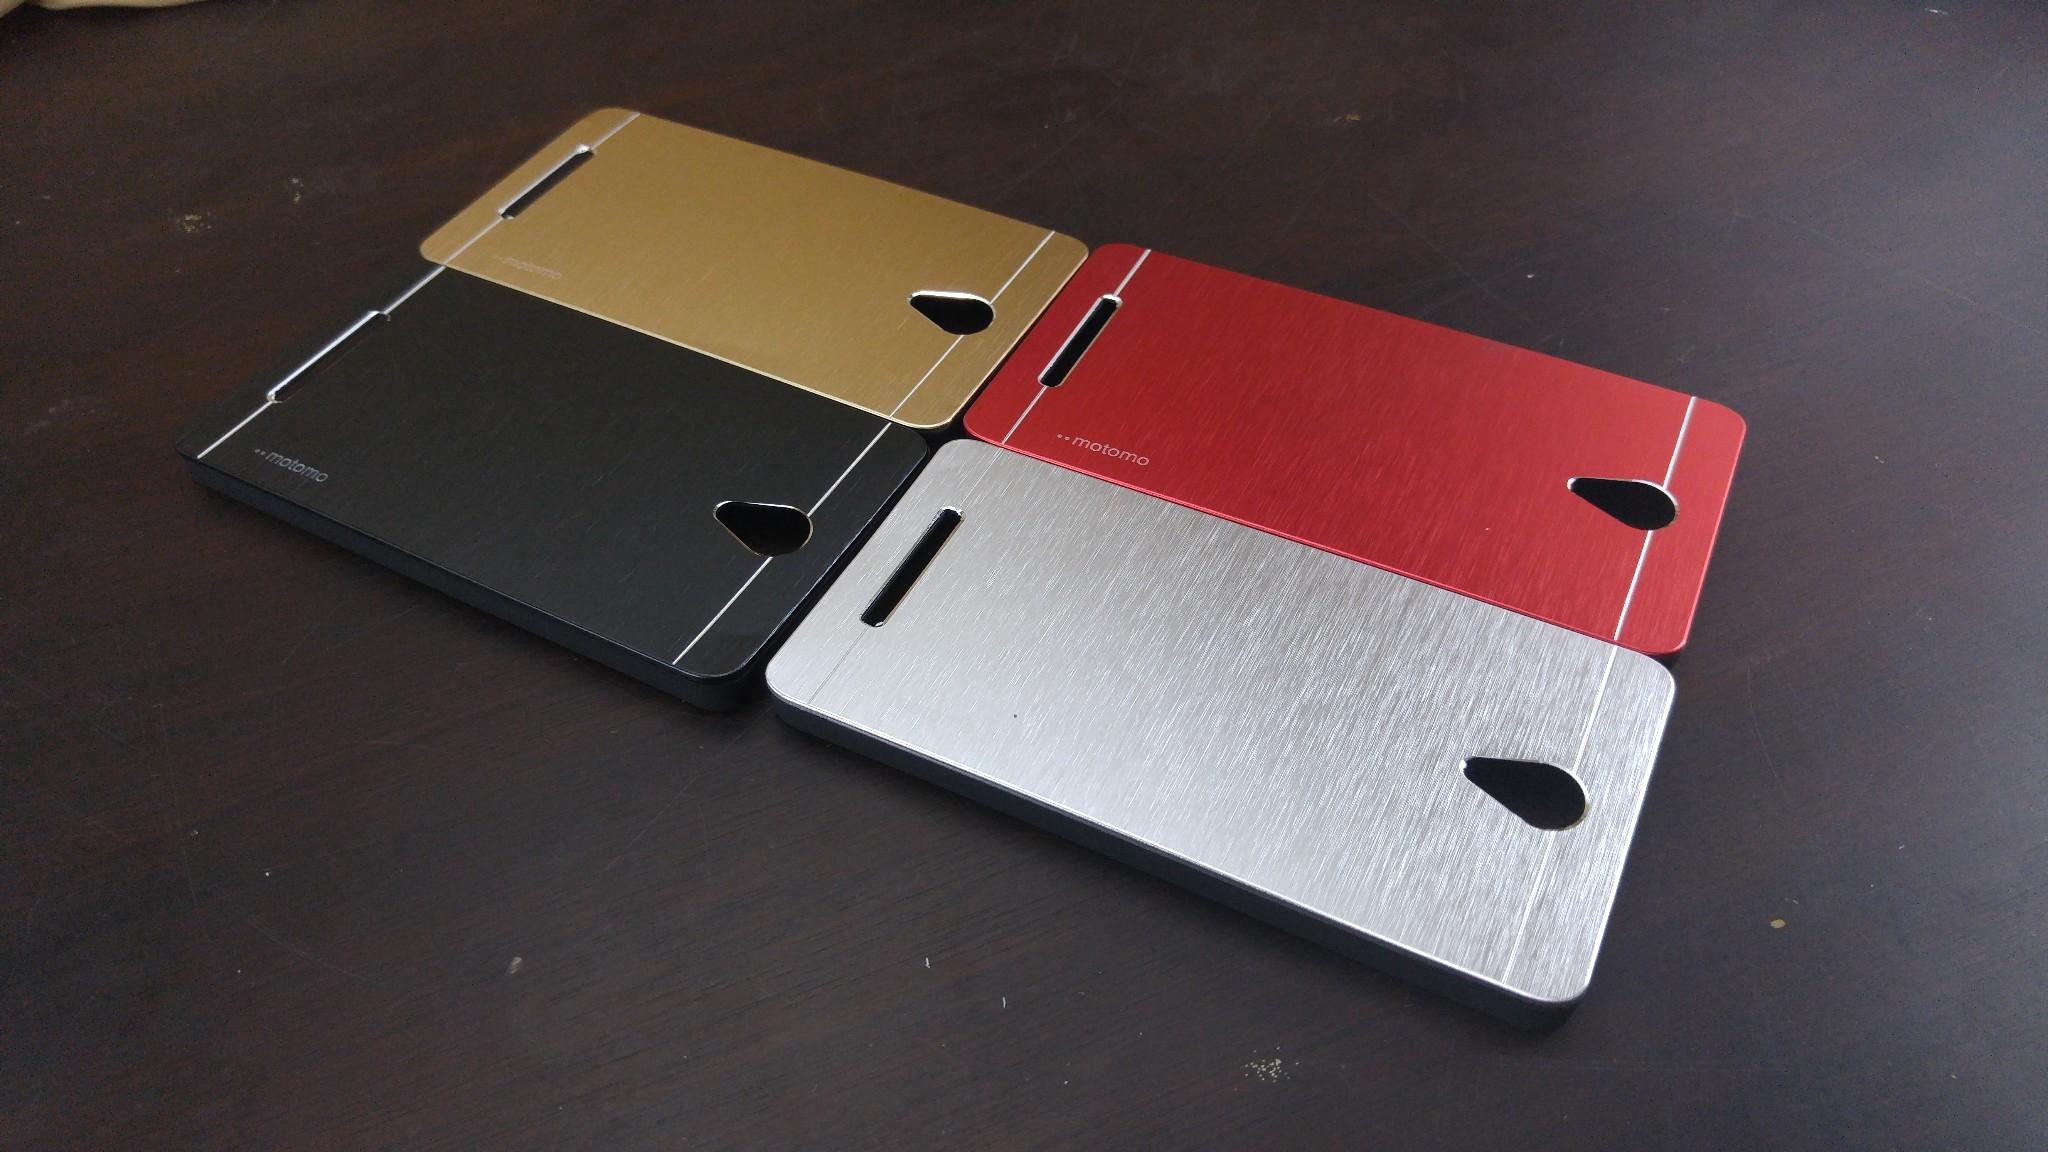 Motomo Metal Case For Xiaomi Redmi 4 Daftar Harga Terkini Dan Mi 4i Back Hardcase Color Source Cover